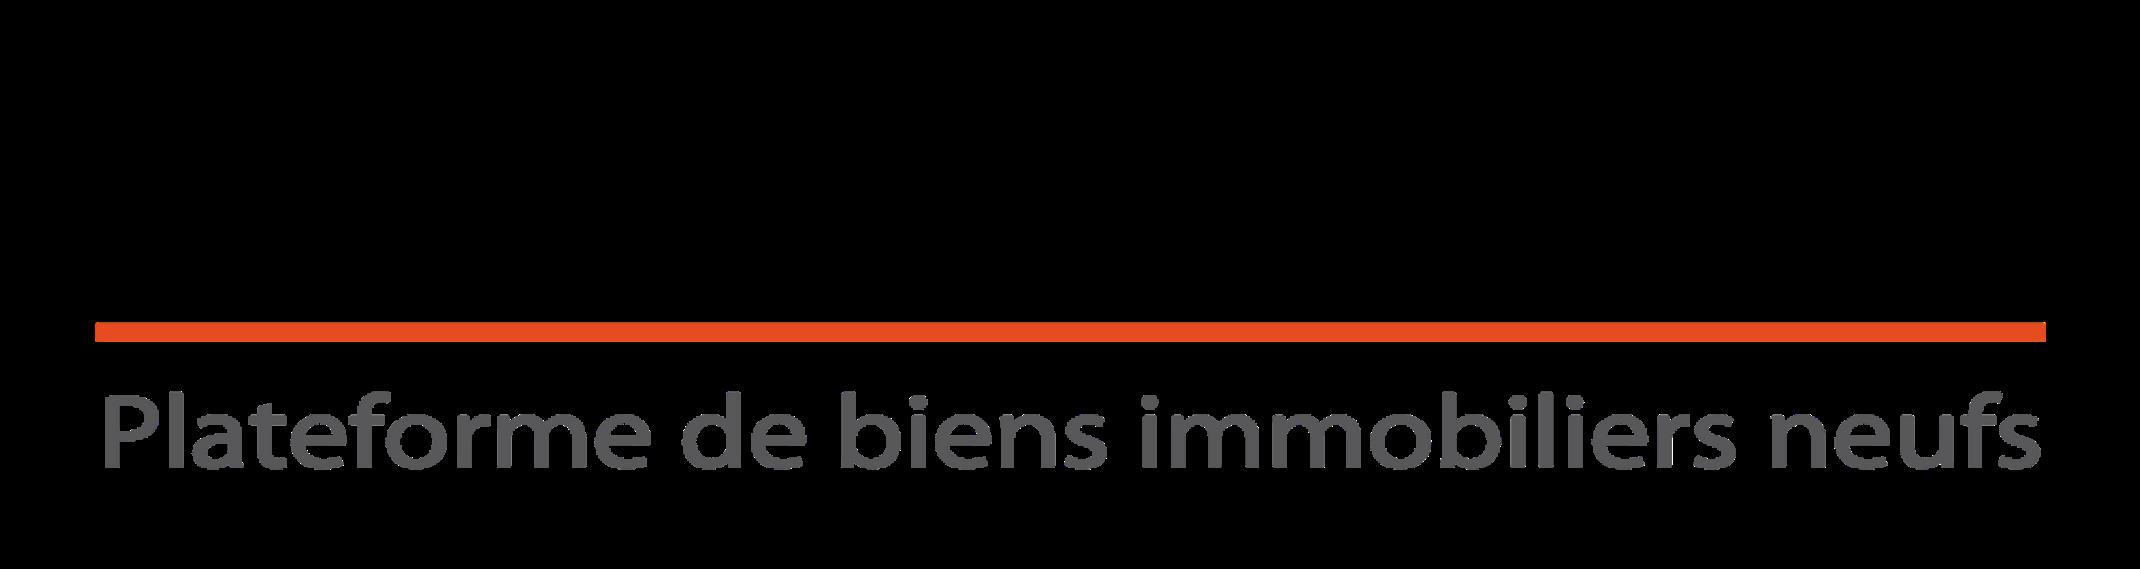 Logo du site internet defiscalisation.net